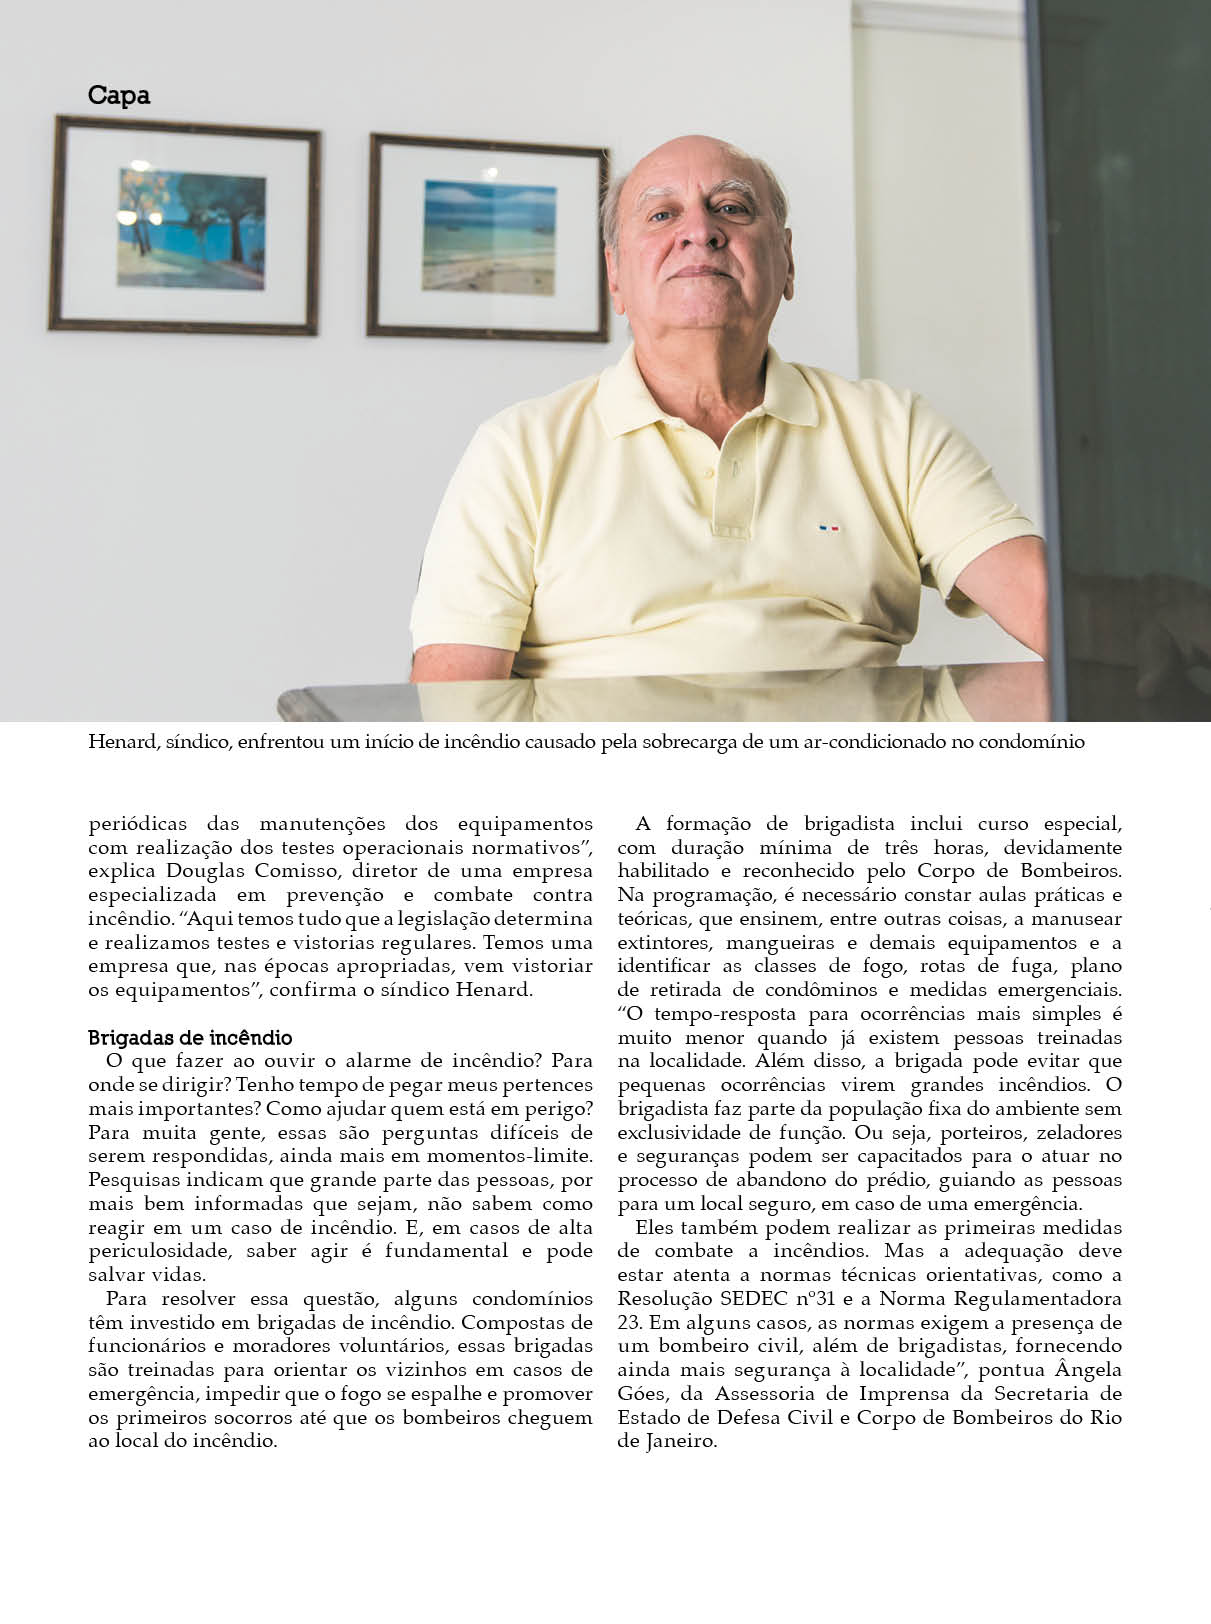 Revista Síndico_ed 23914